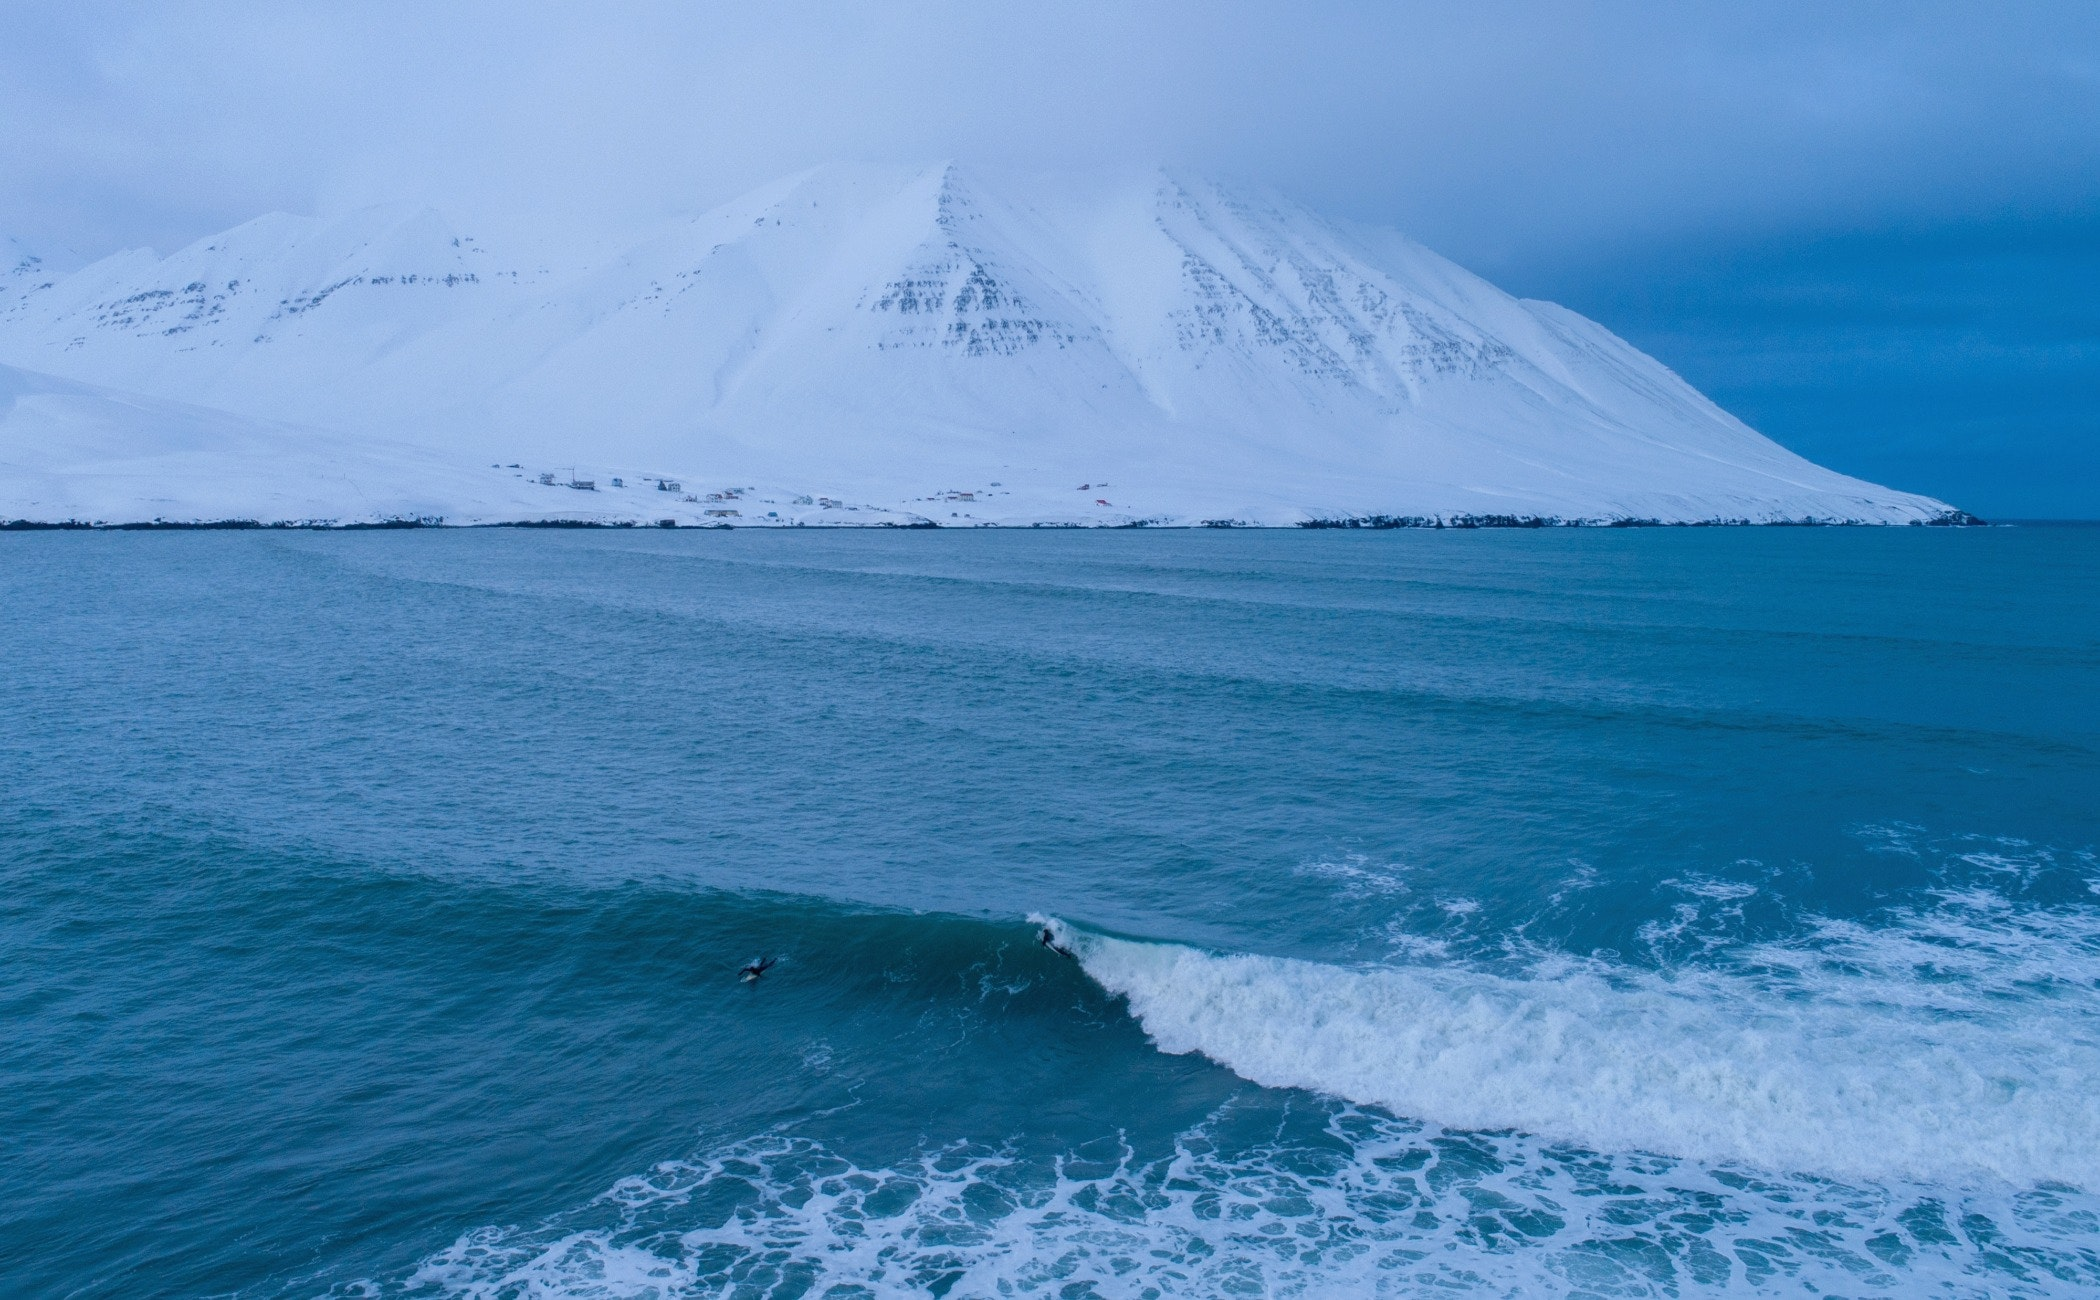 nature,outdoors,mountain,ice,water,sea,ocean,snow